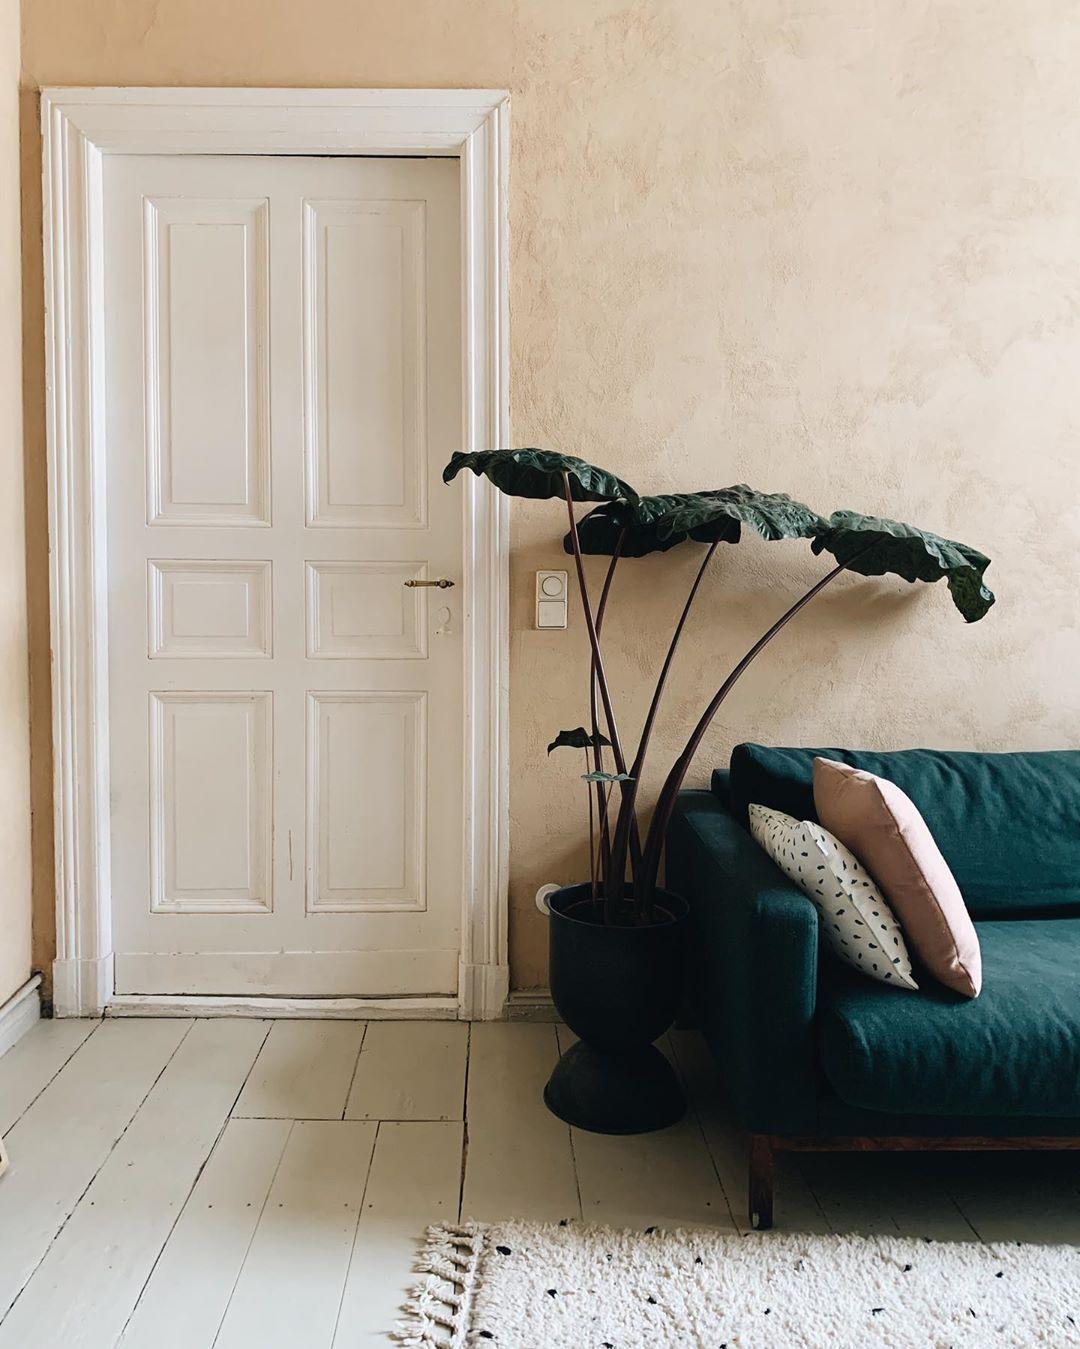 #plant#door#sofa#interiors